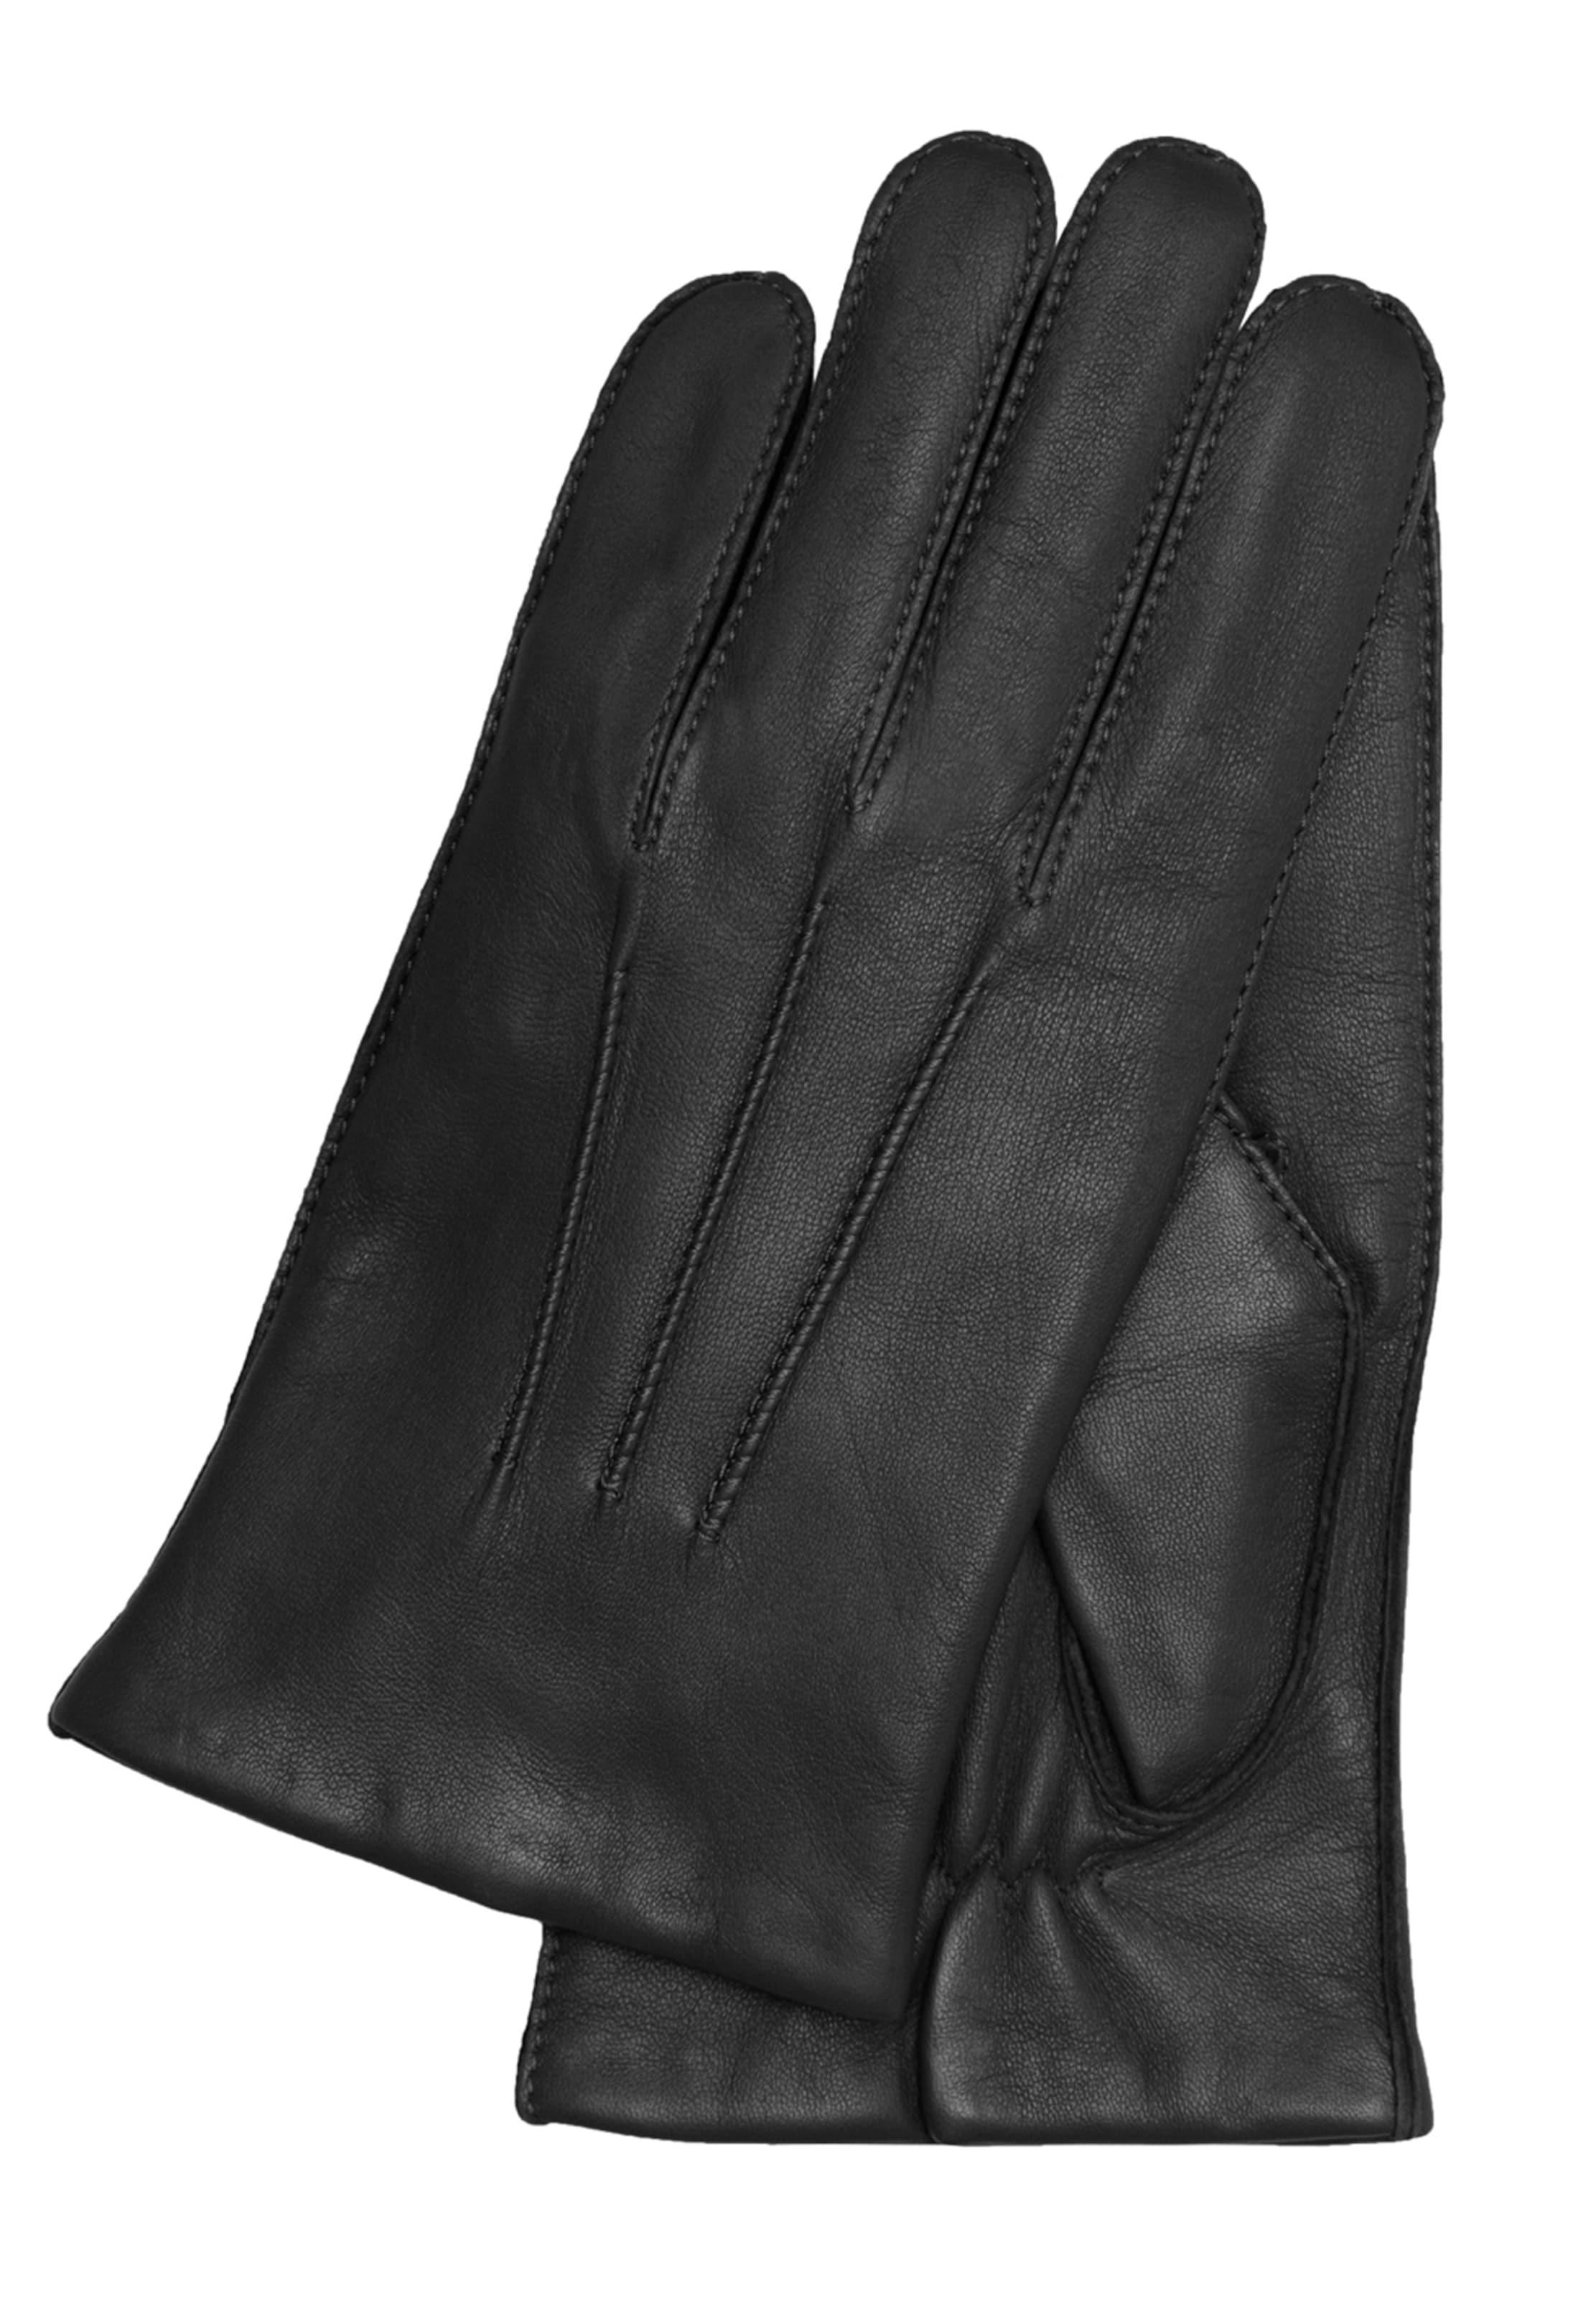 Schwarz Handschuh Handschuh In Kessler 'paul' 'paul' In Schwarz Kessler fgyY76b